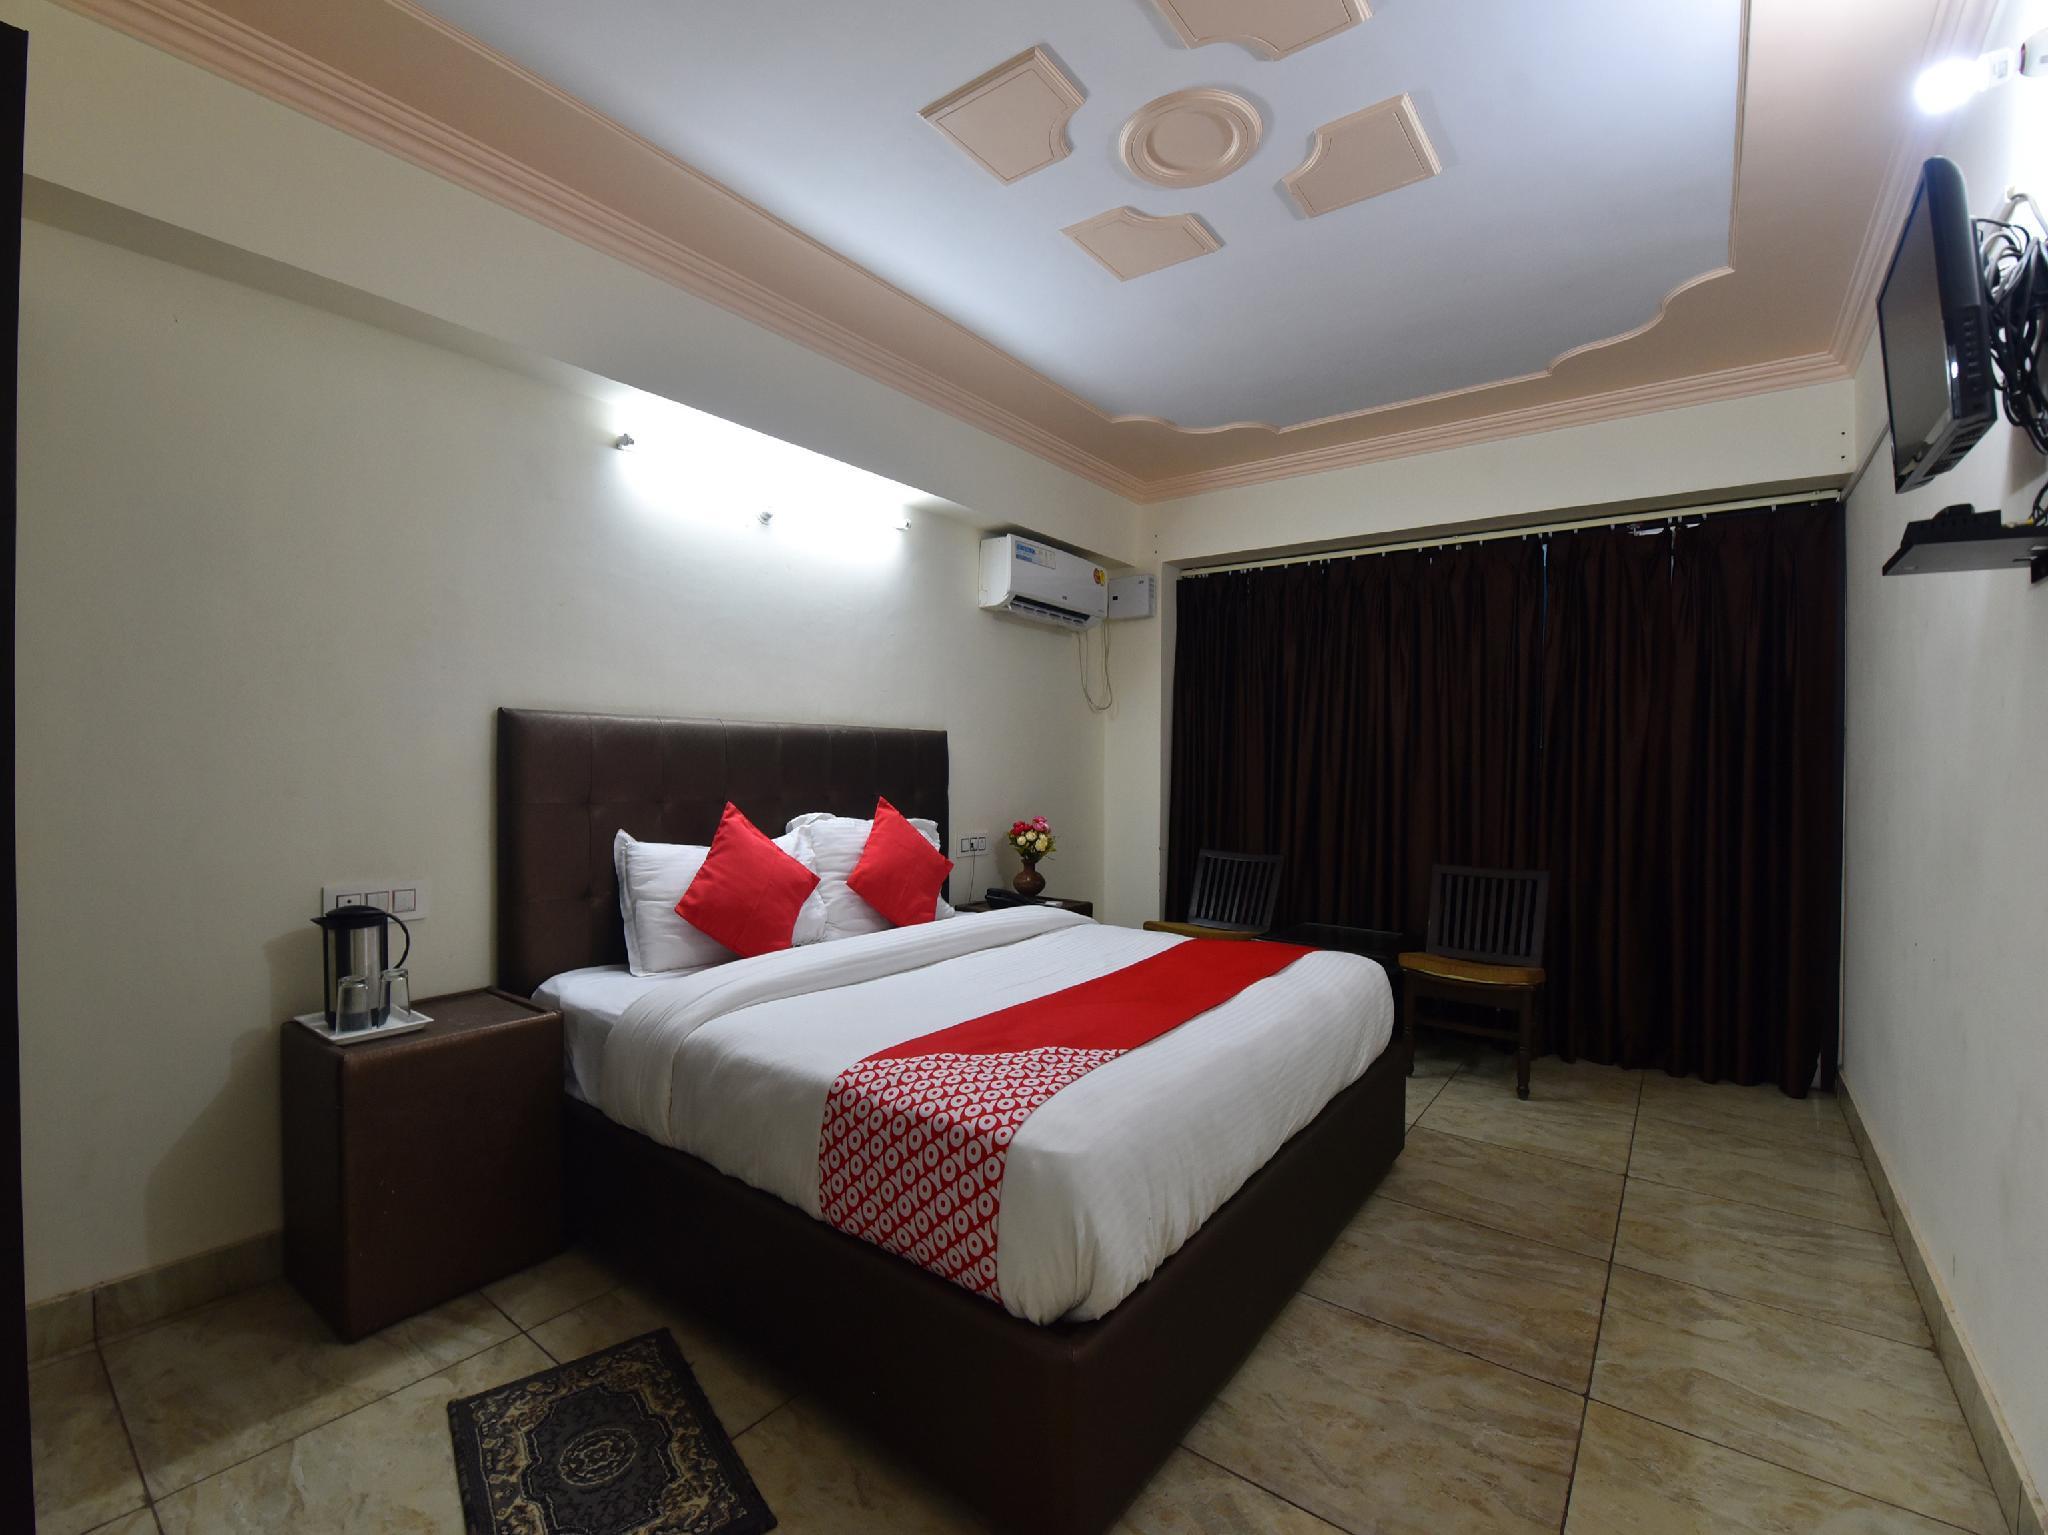 OYO 28555 Sandalee Comforts, Mandi